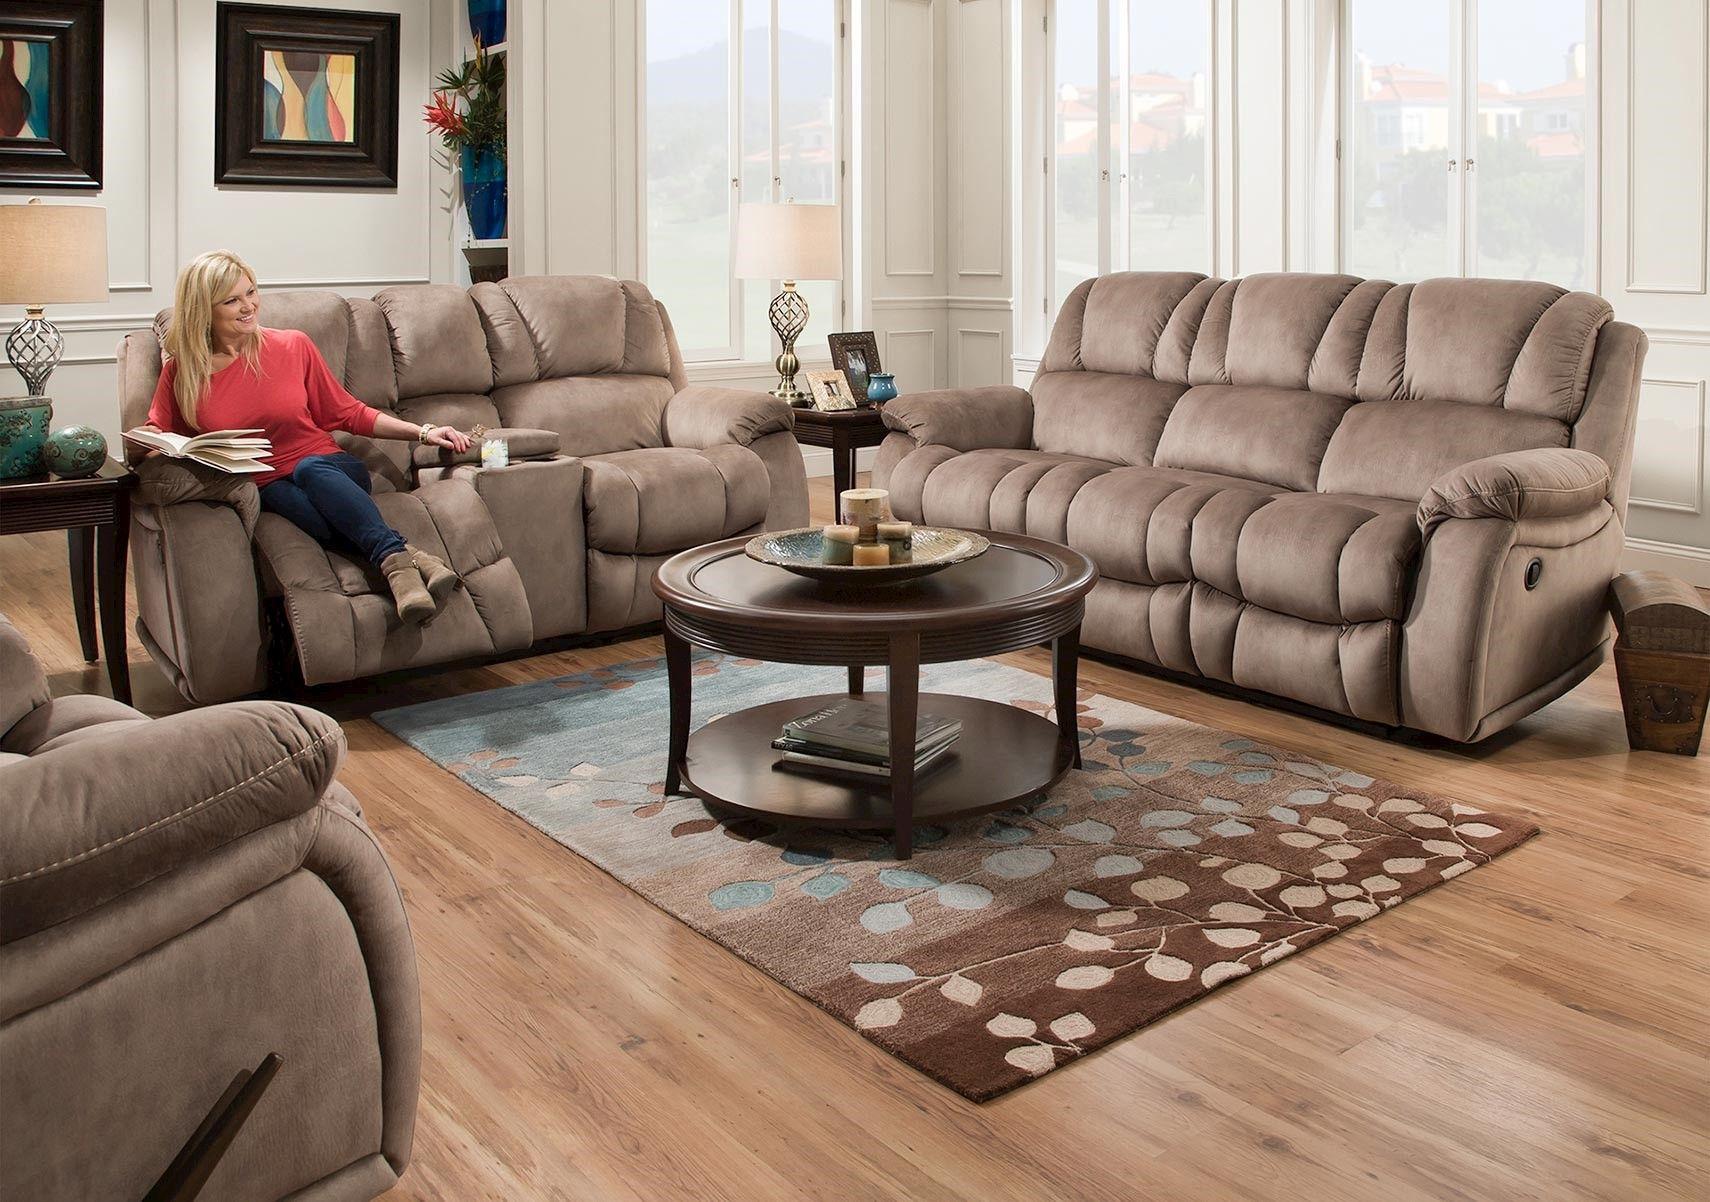 Lacks Tyler 3 Pc Reclining Living Room Set Living Room Sets